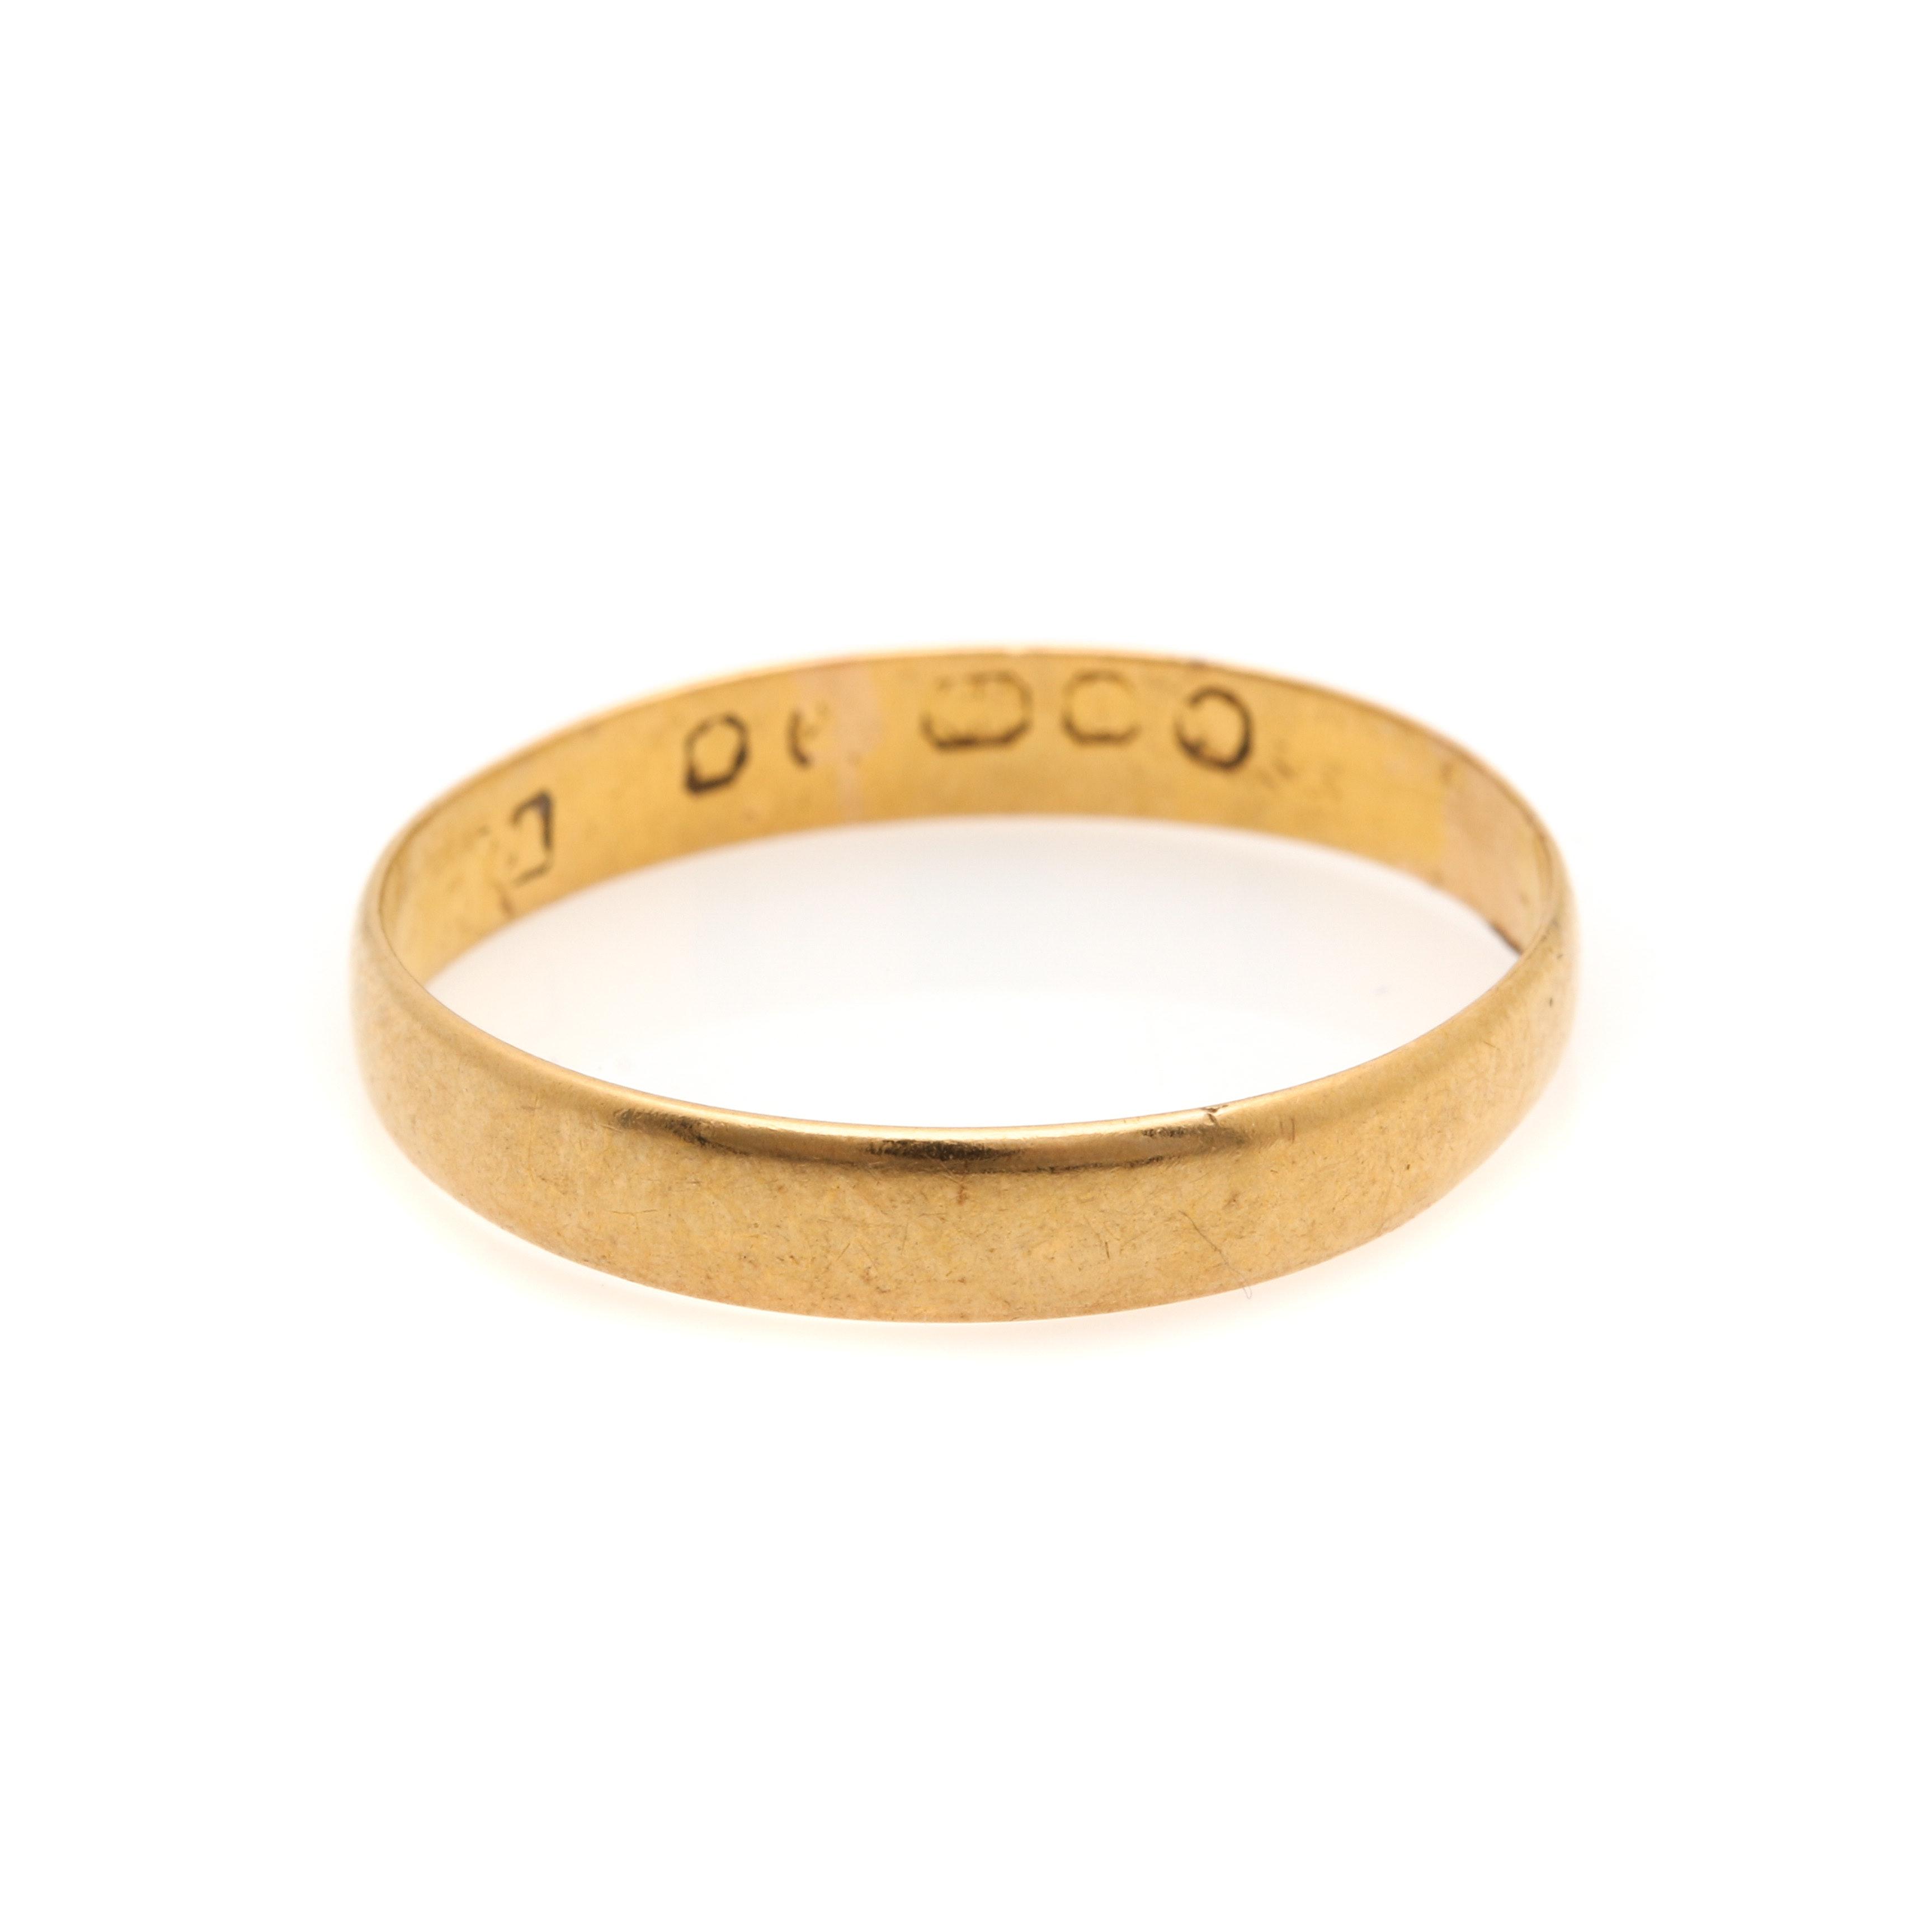 22K Yellow Gold Ring Band